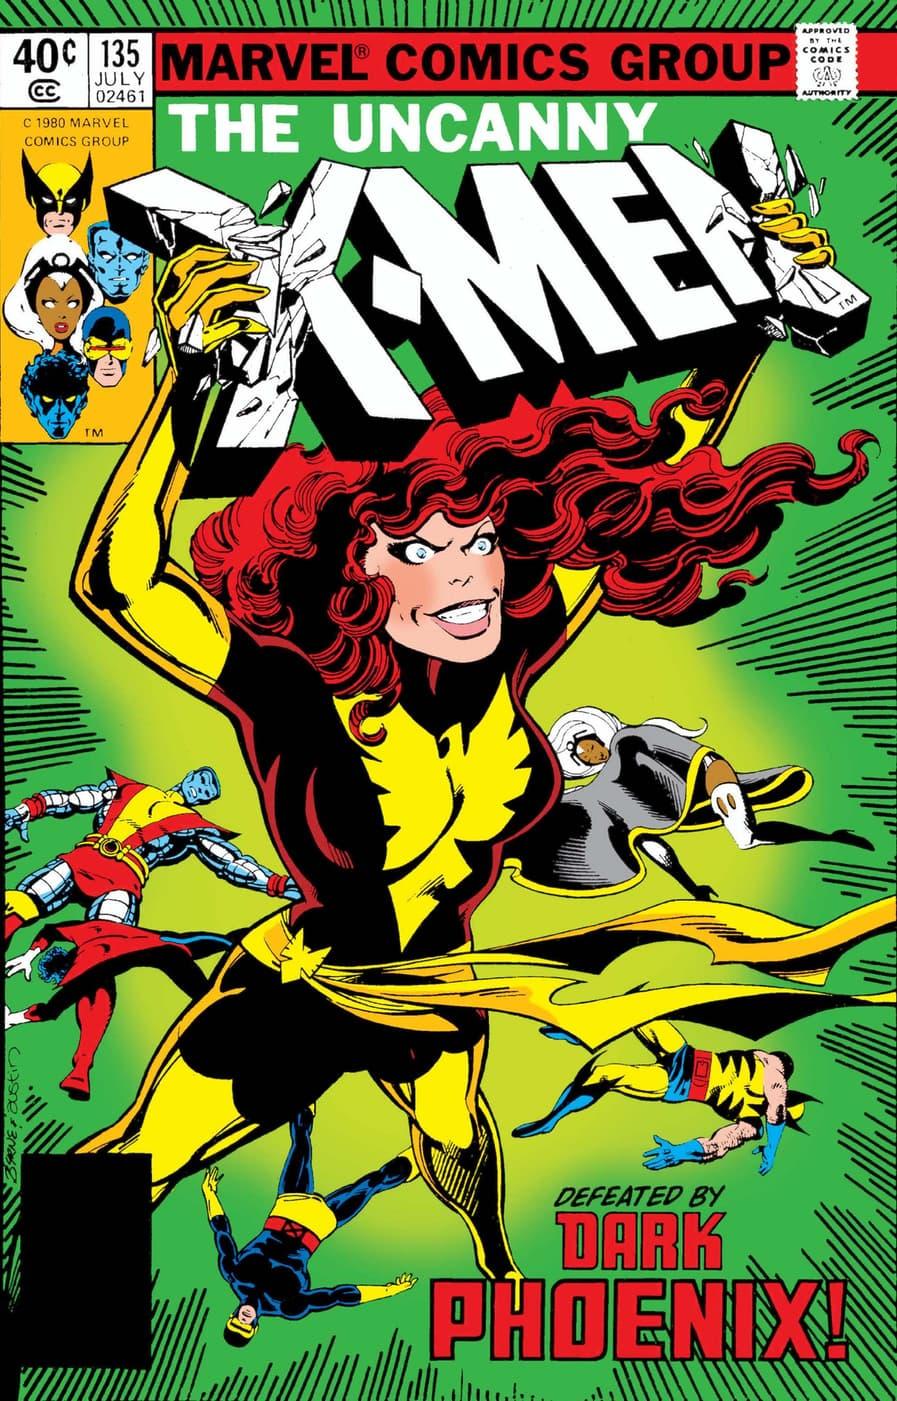 Uncanny X-Men #135